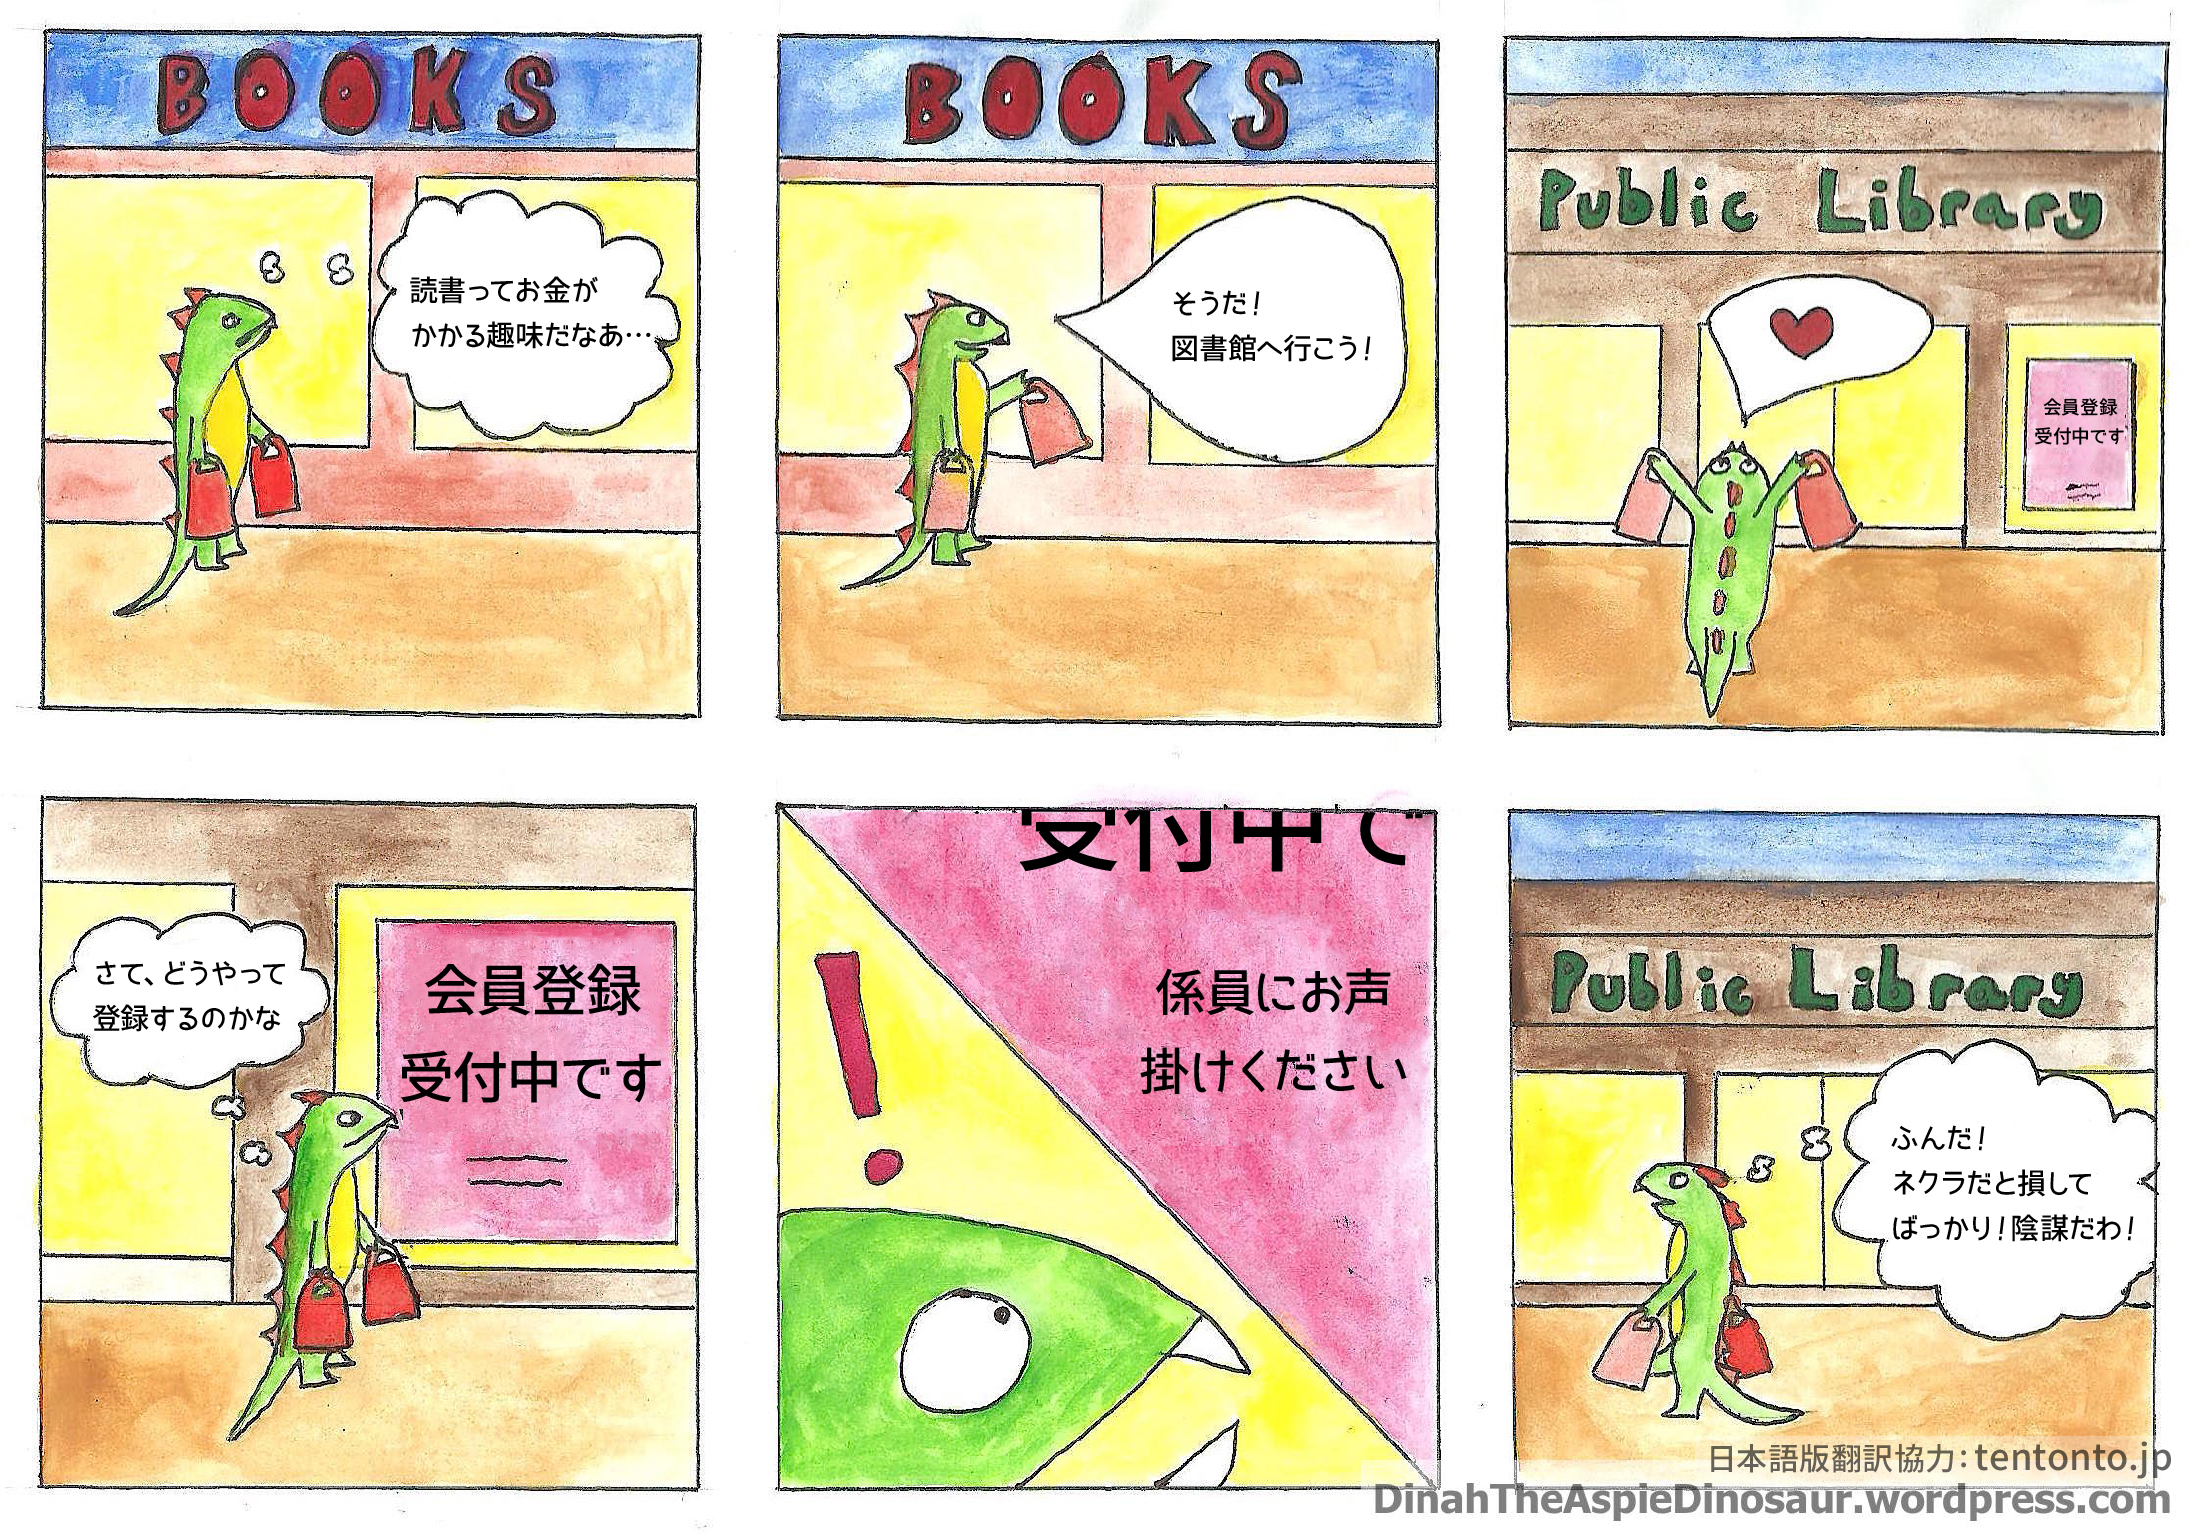 library-dinah-jpn